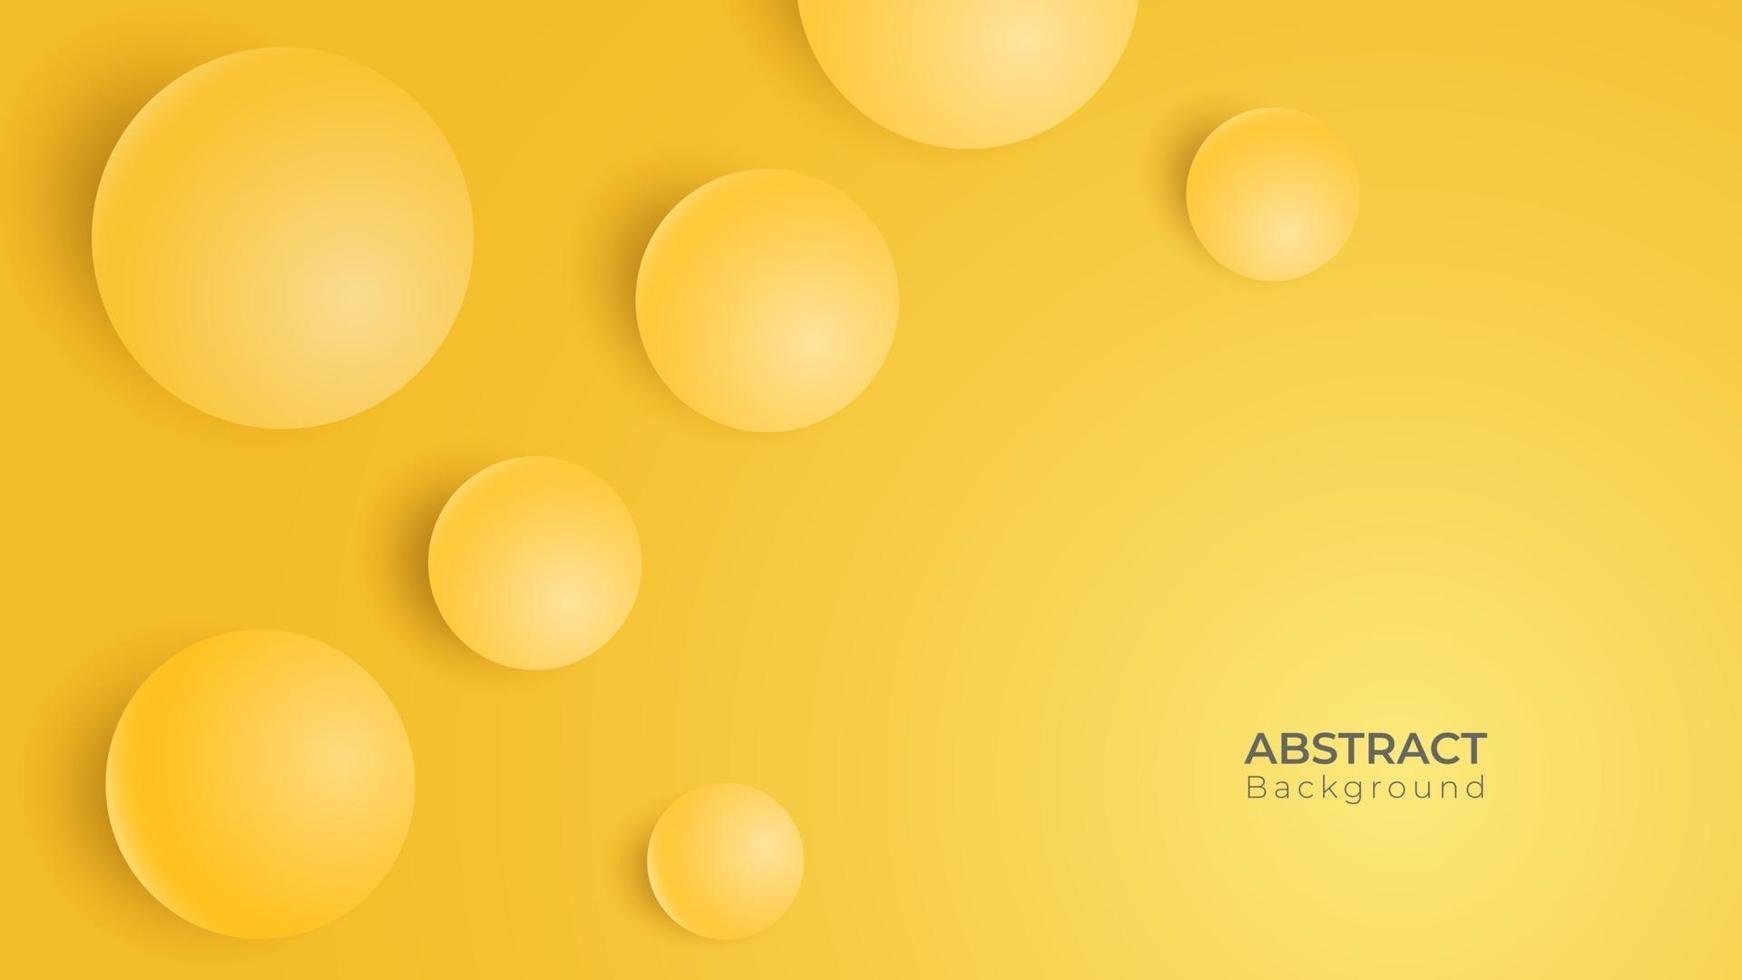 abstrakt 3d modern rund cirkel bakgrund. gul geometrisk banner. vektor konst illustration